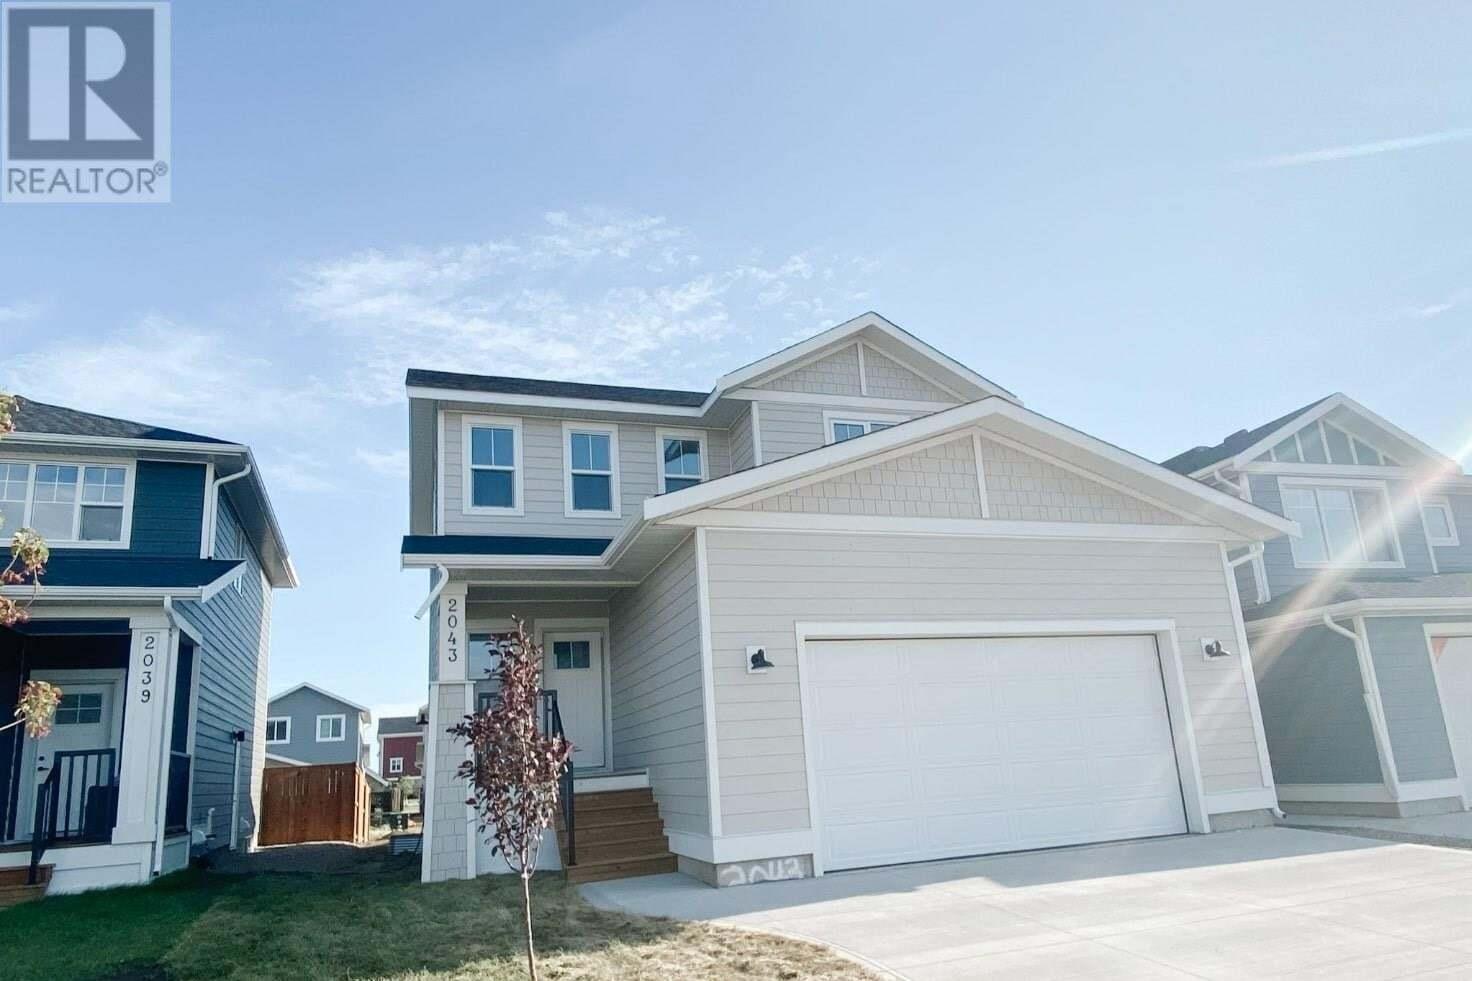 House for sale at 2043 Stilling Ln Saskatoon Saskatchewan - MLS: SK821144